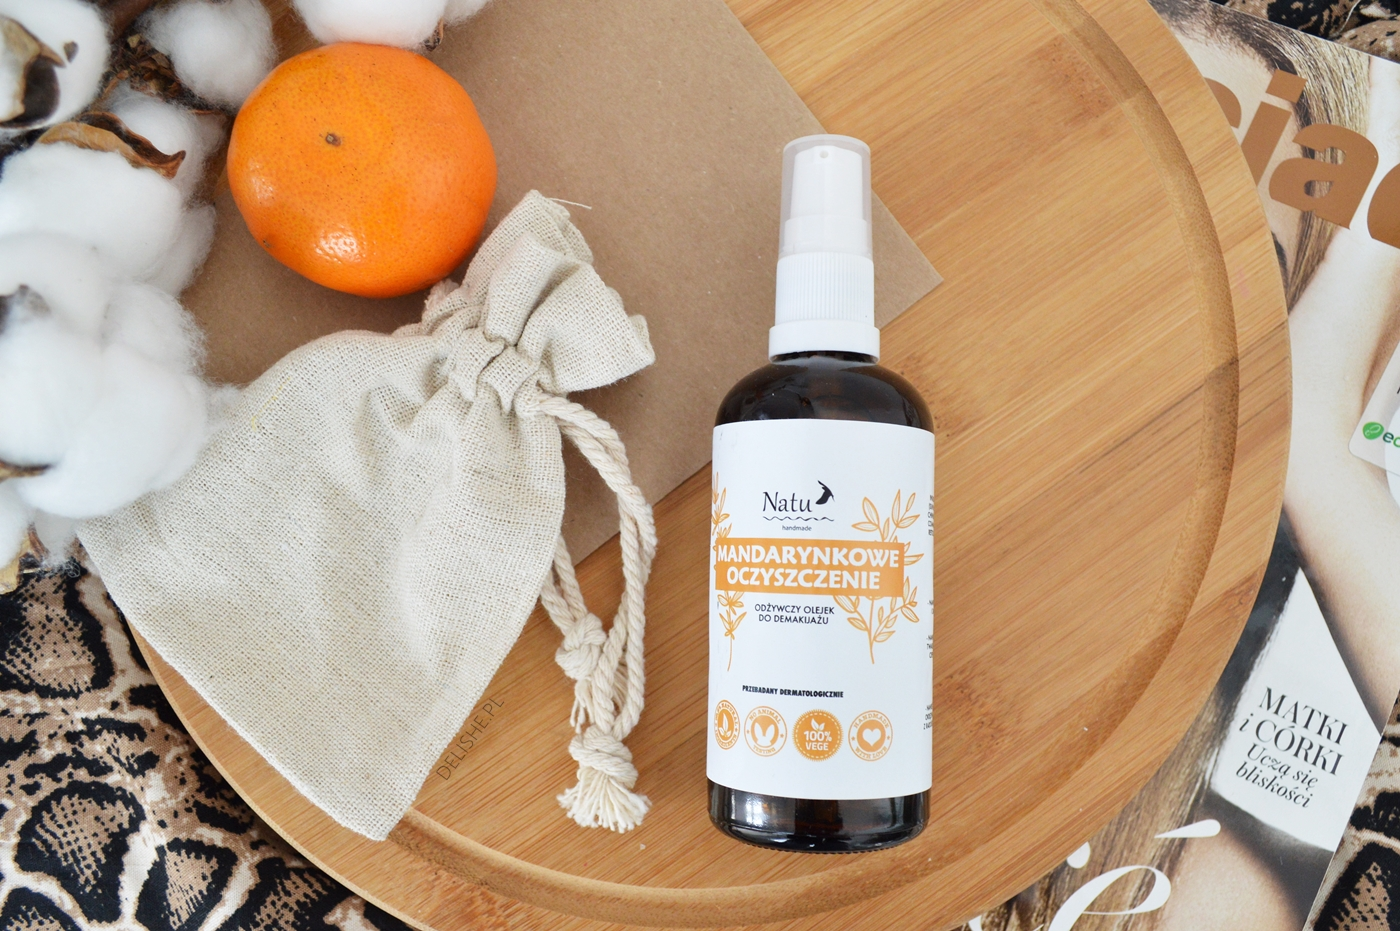 natu handmade olejek kosmetyki naturalne ekocuda zakupy